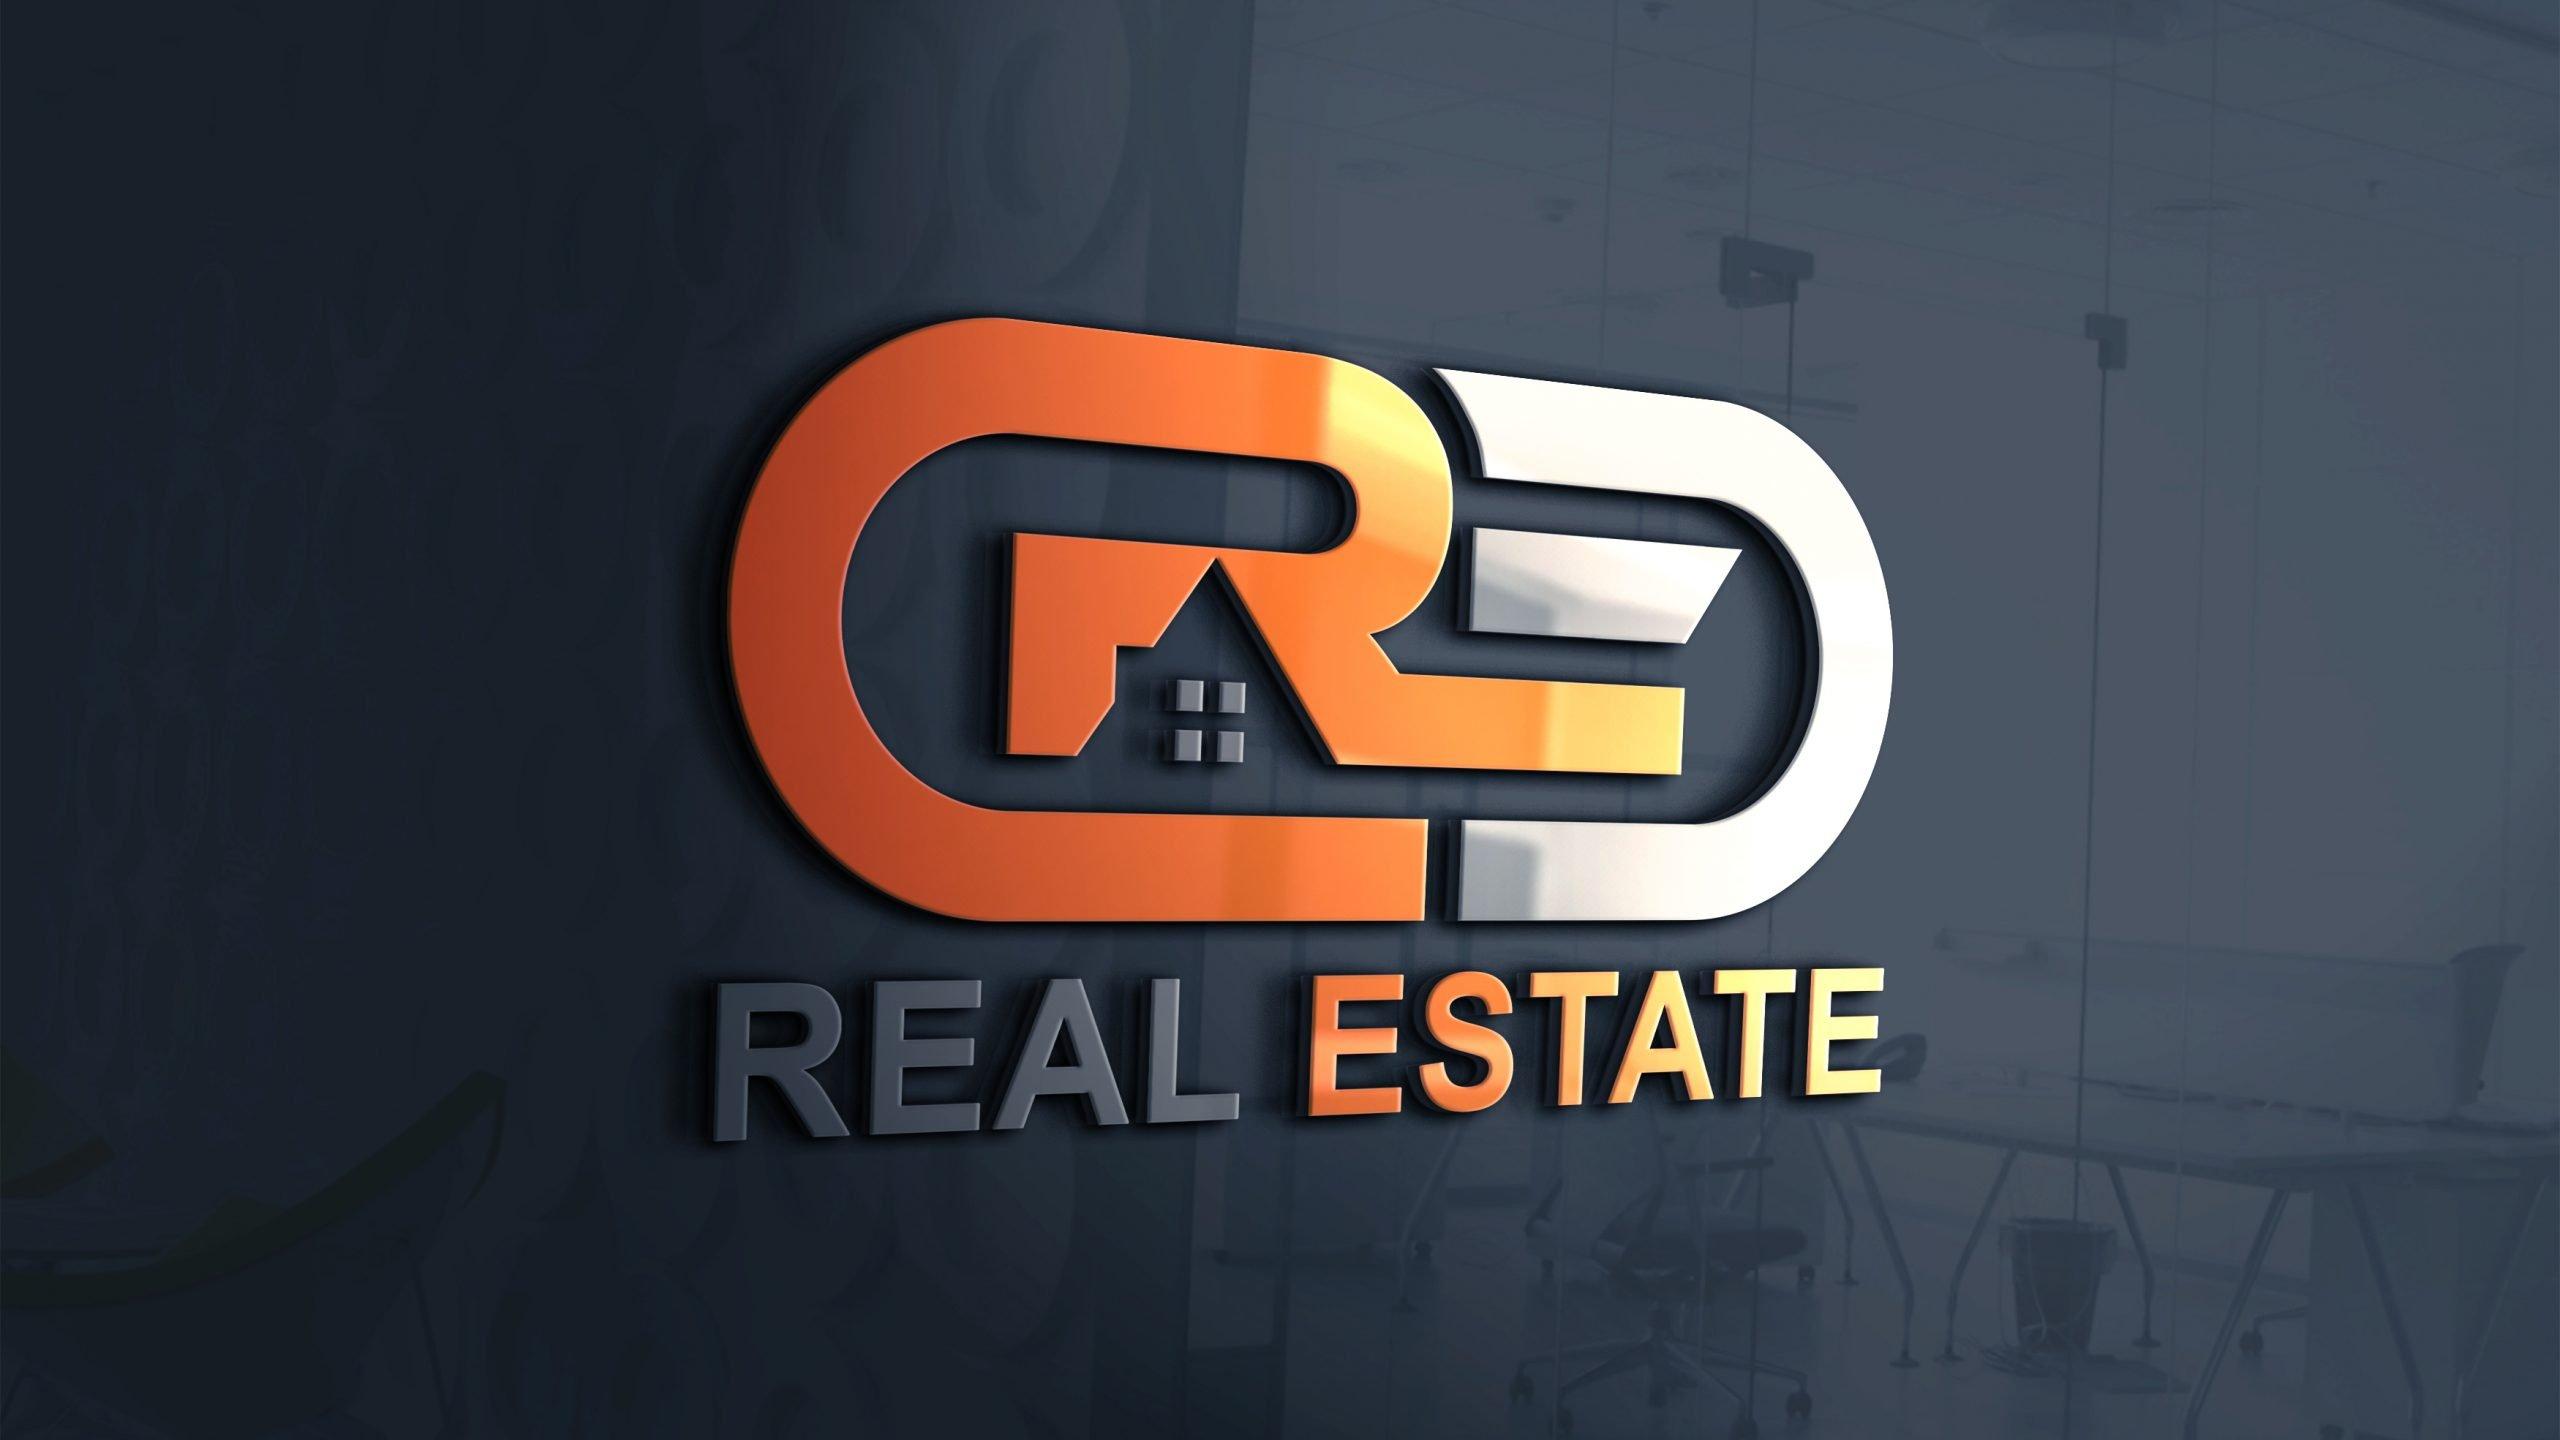 Free Download Modern Real Estate Company Logo Design PSD